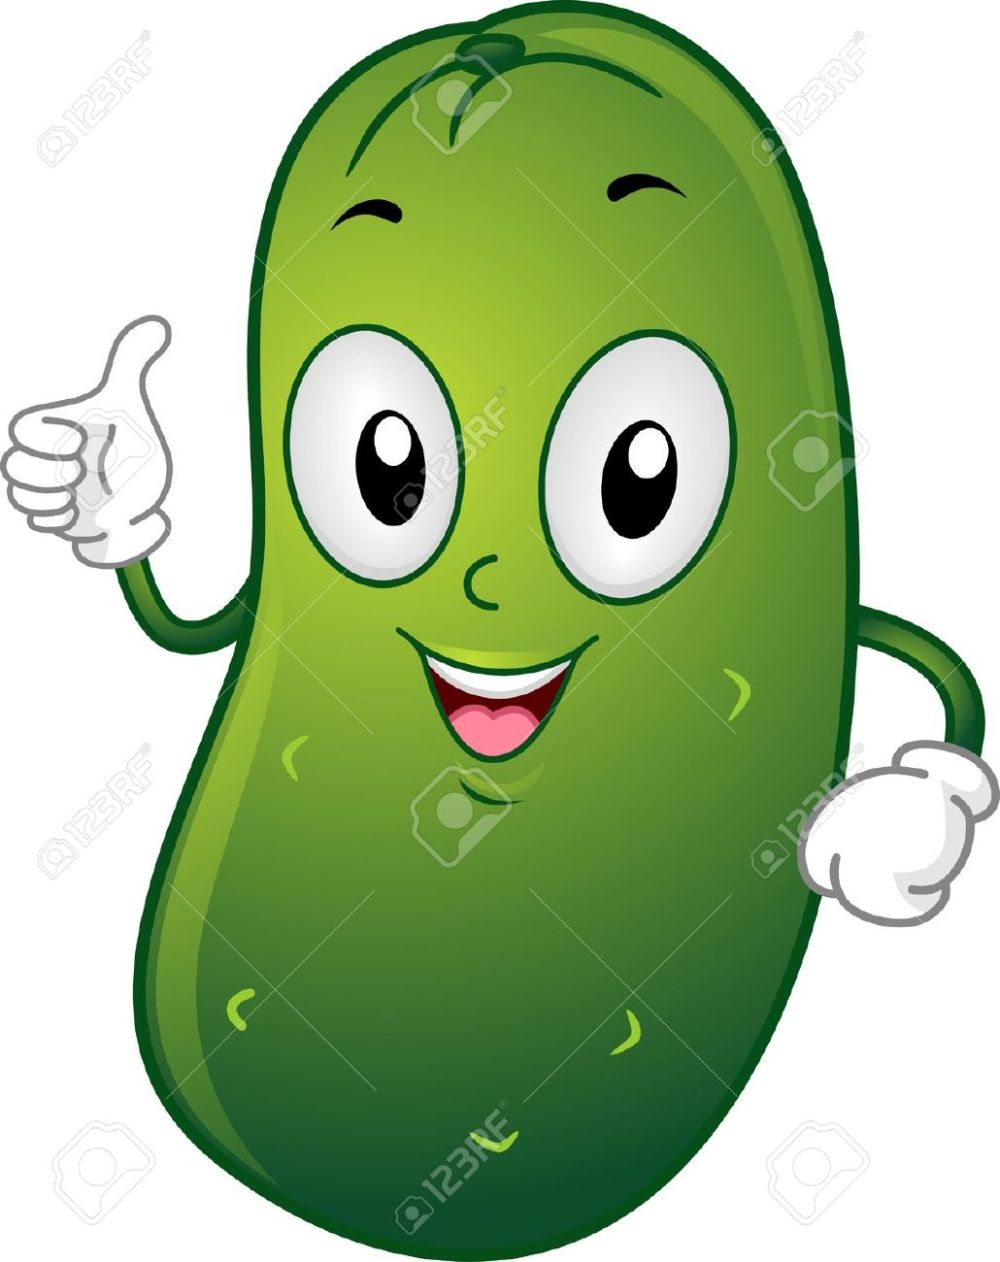 medium resolution of 1030x1300 pickle clipart cute